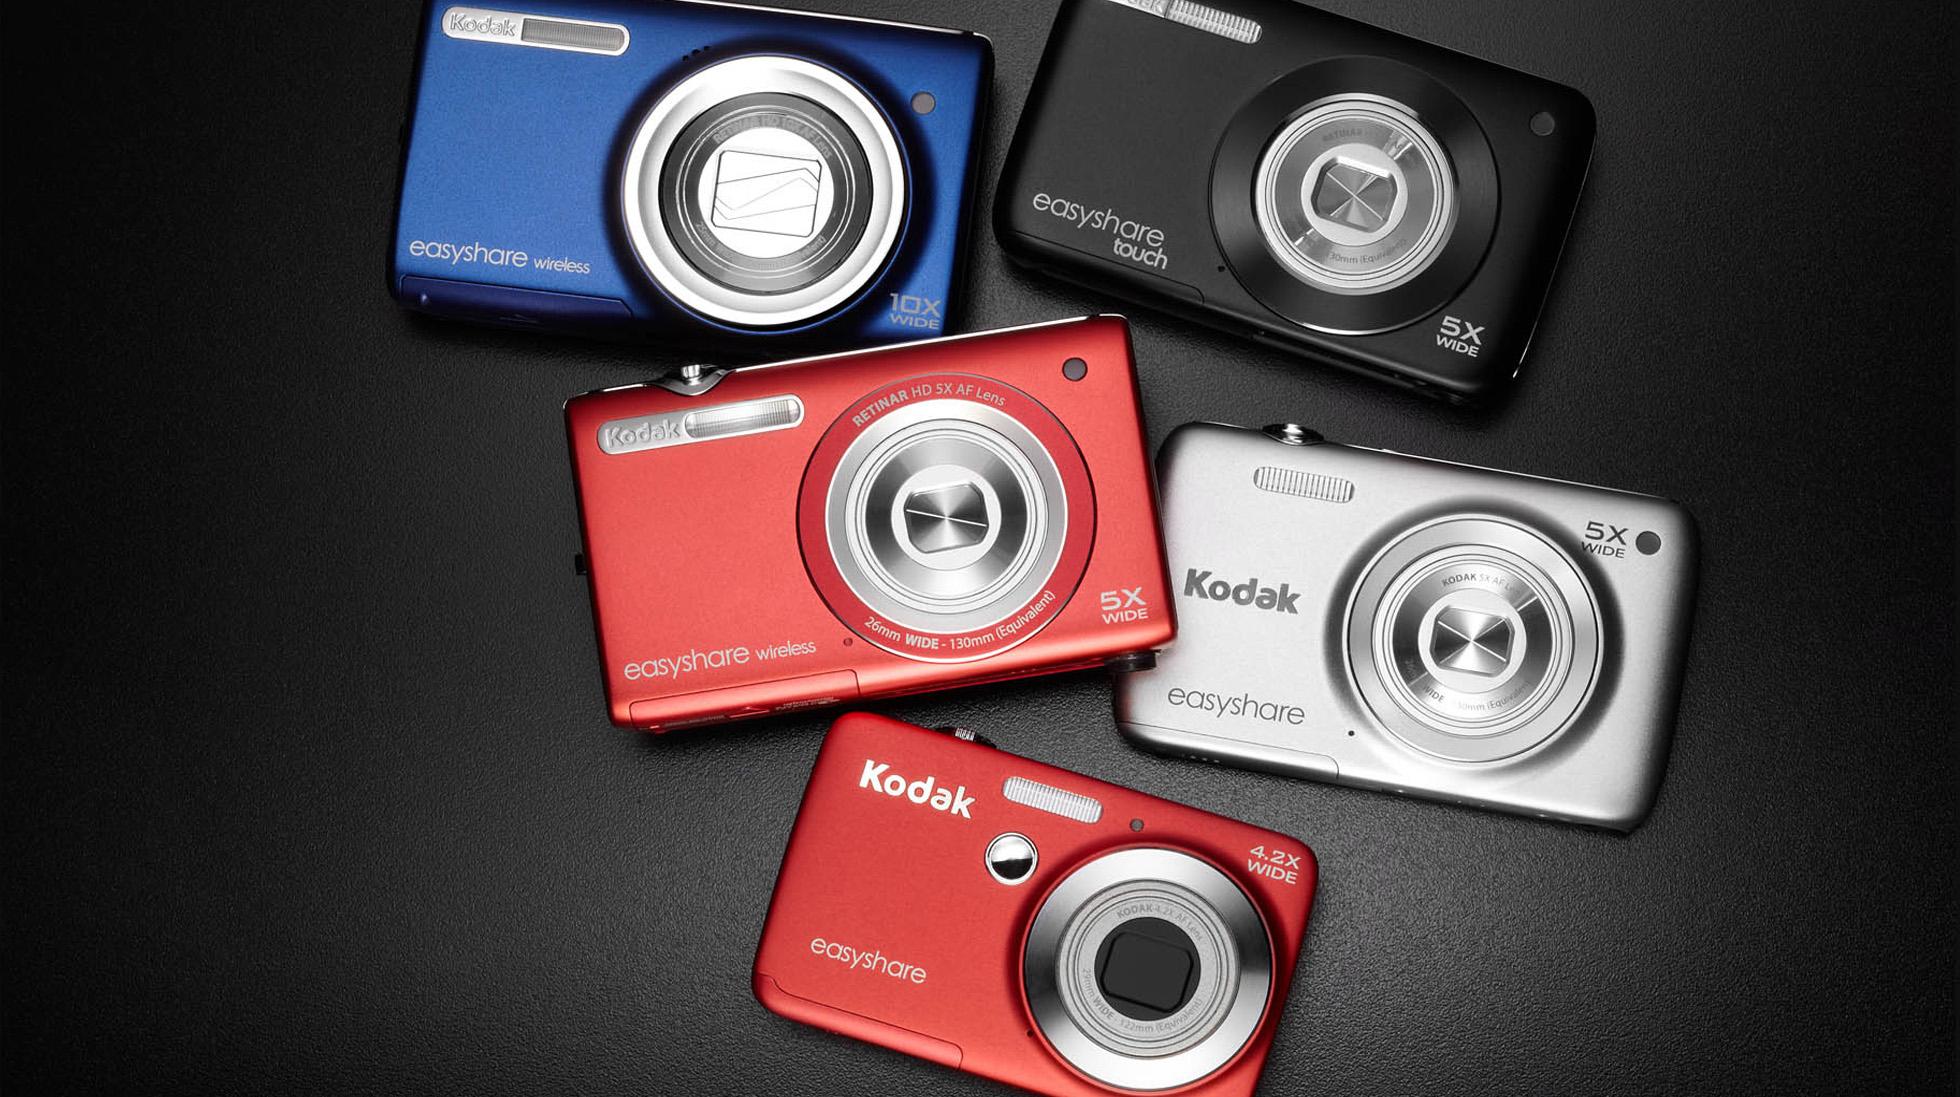 Kodak Digital Camera Design Language